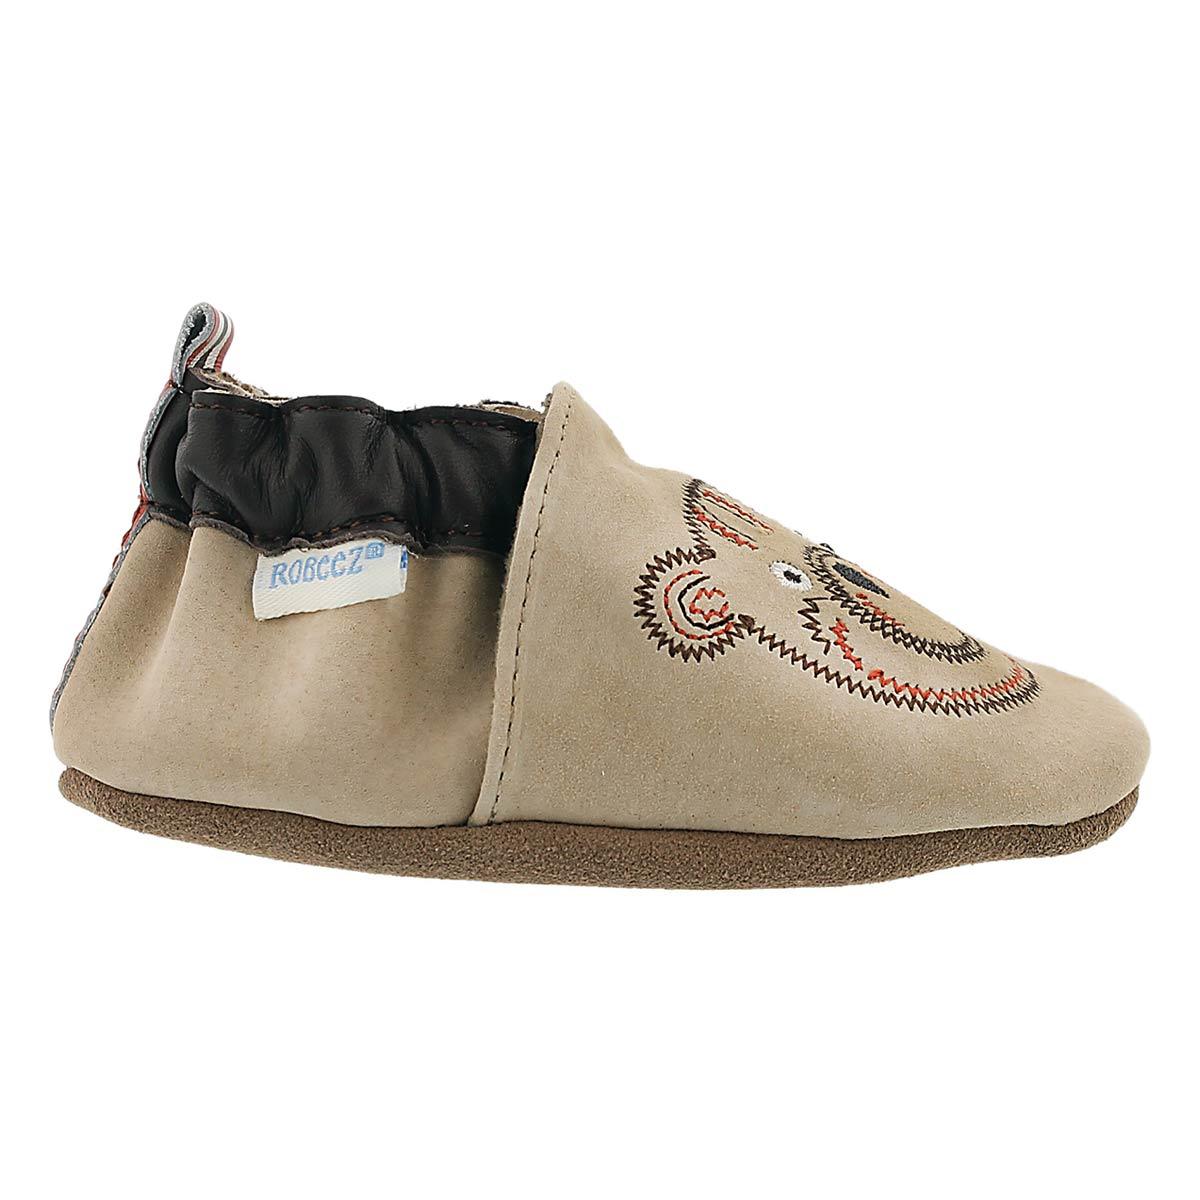 Inf Mr.Bear houndawg soft sole slipper